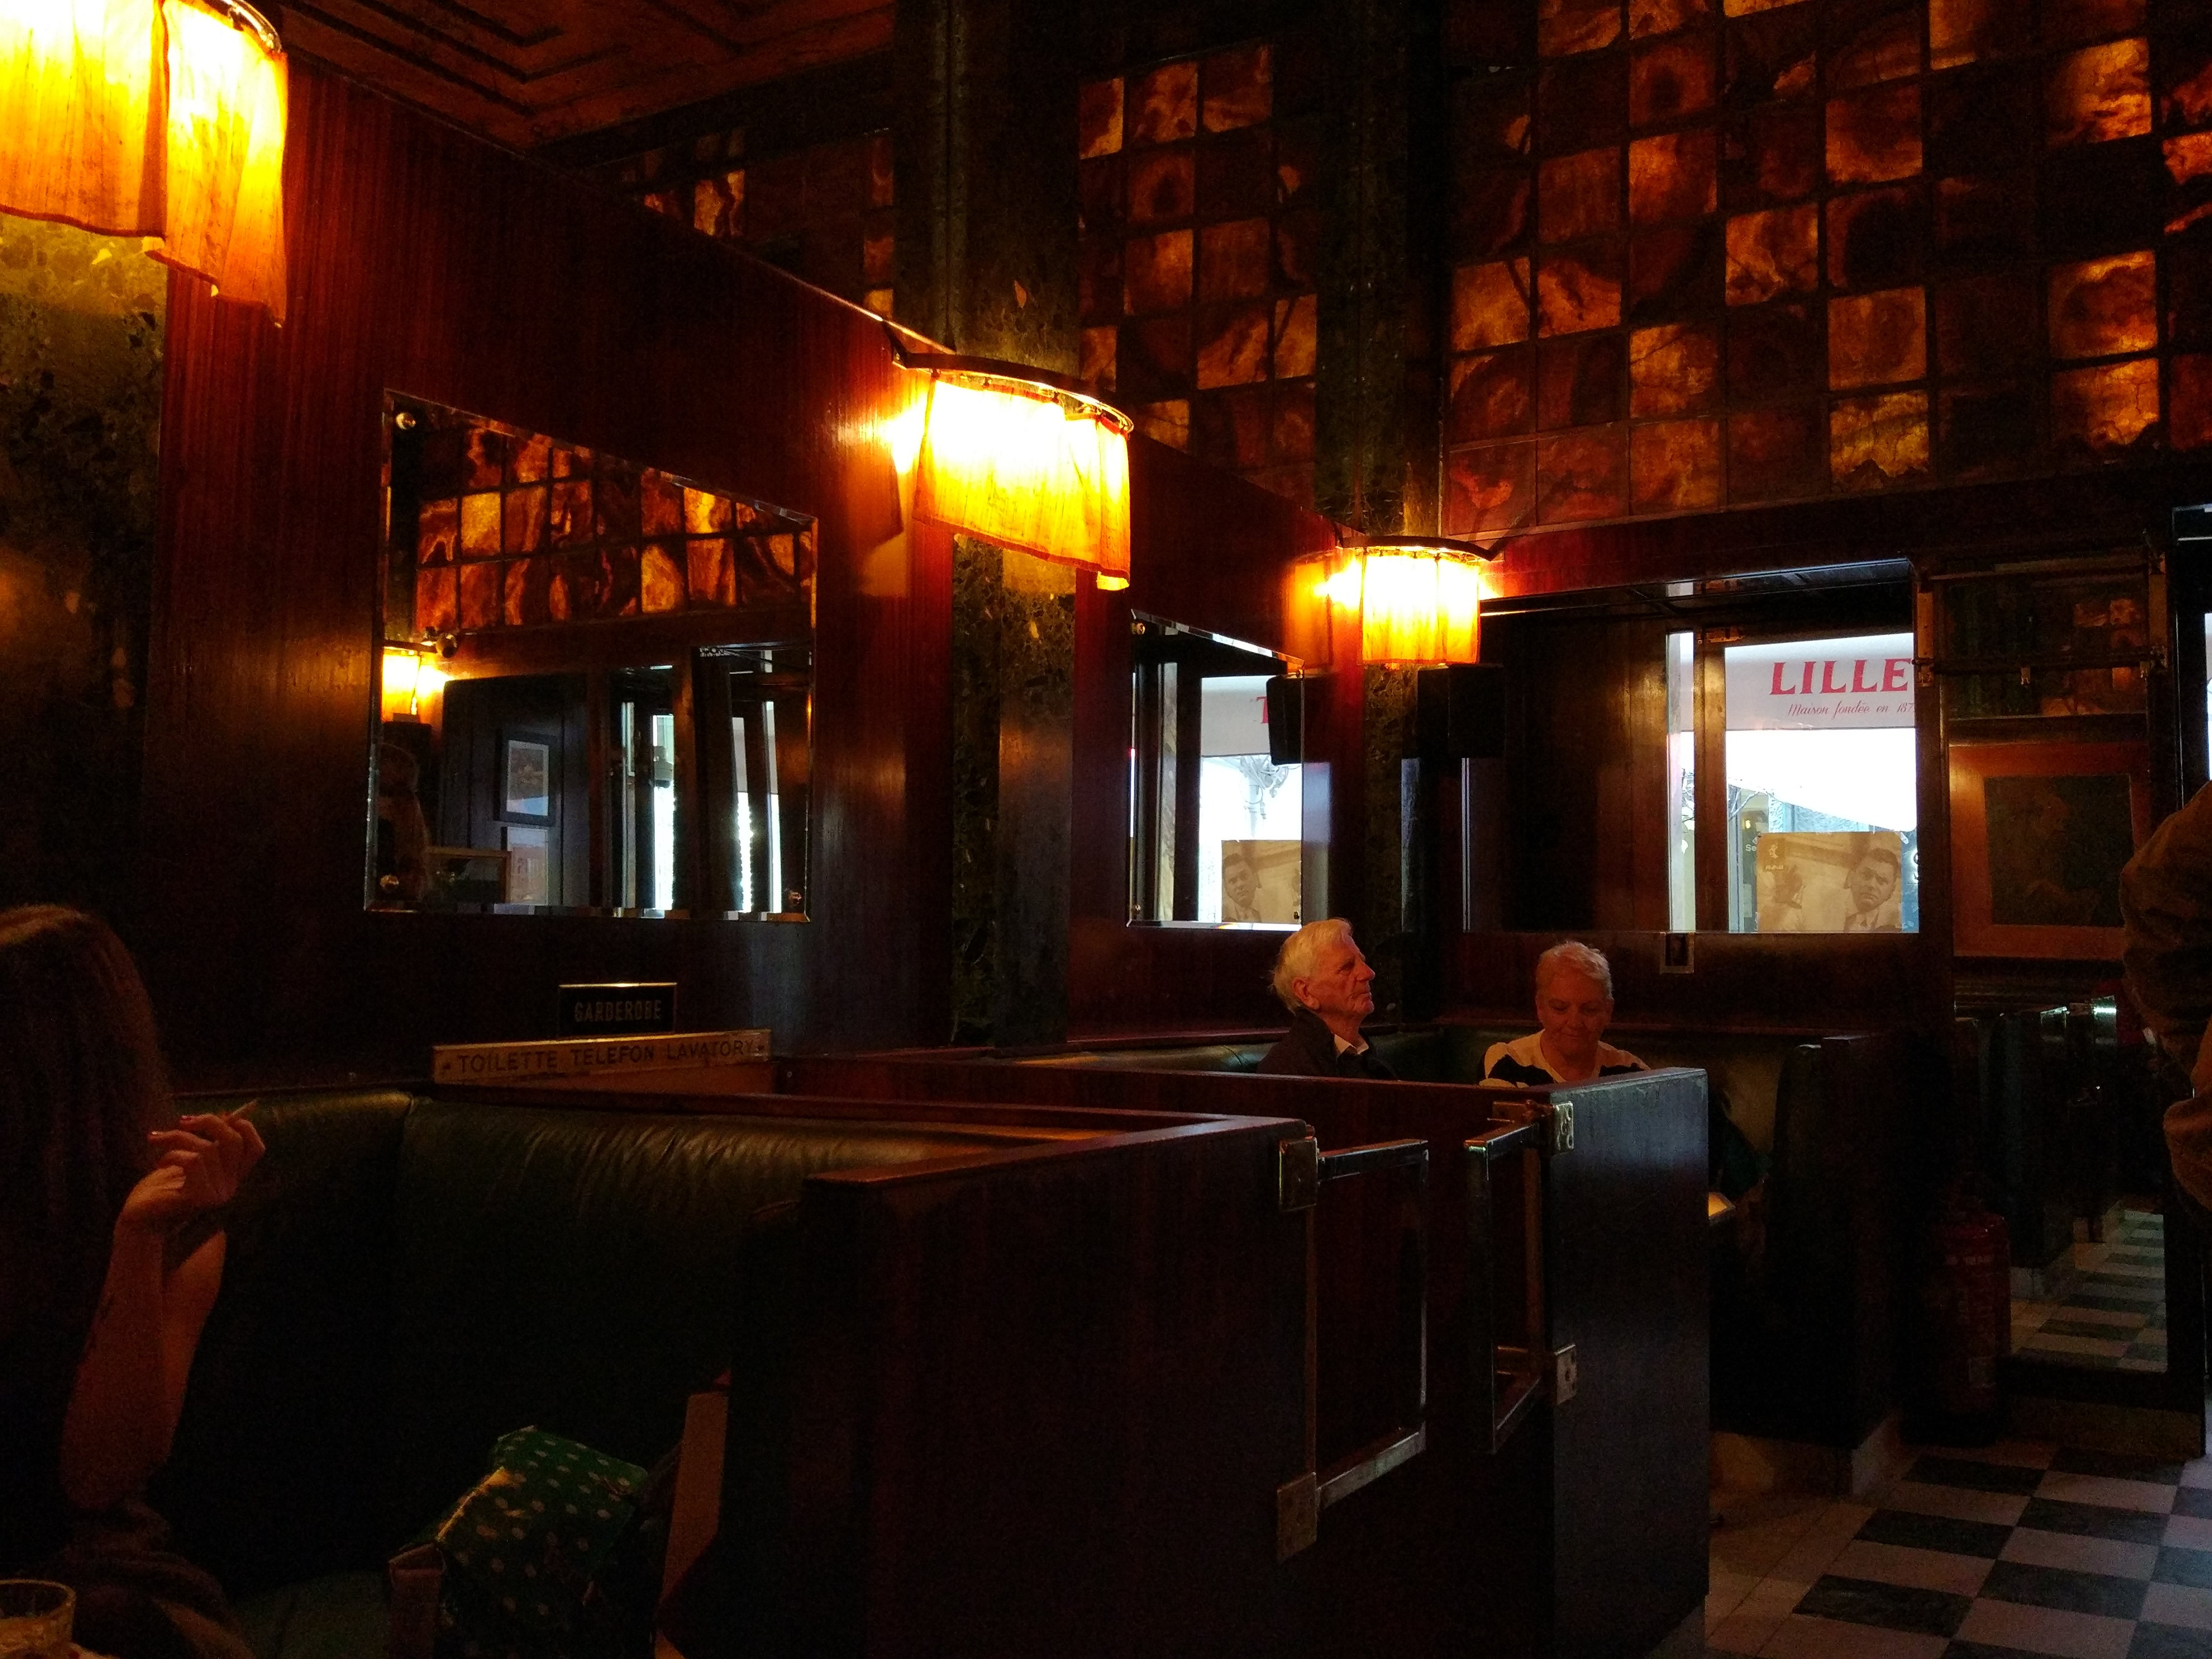 Loos American bar, Vienna